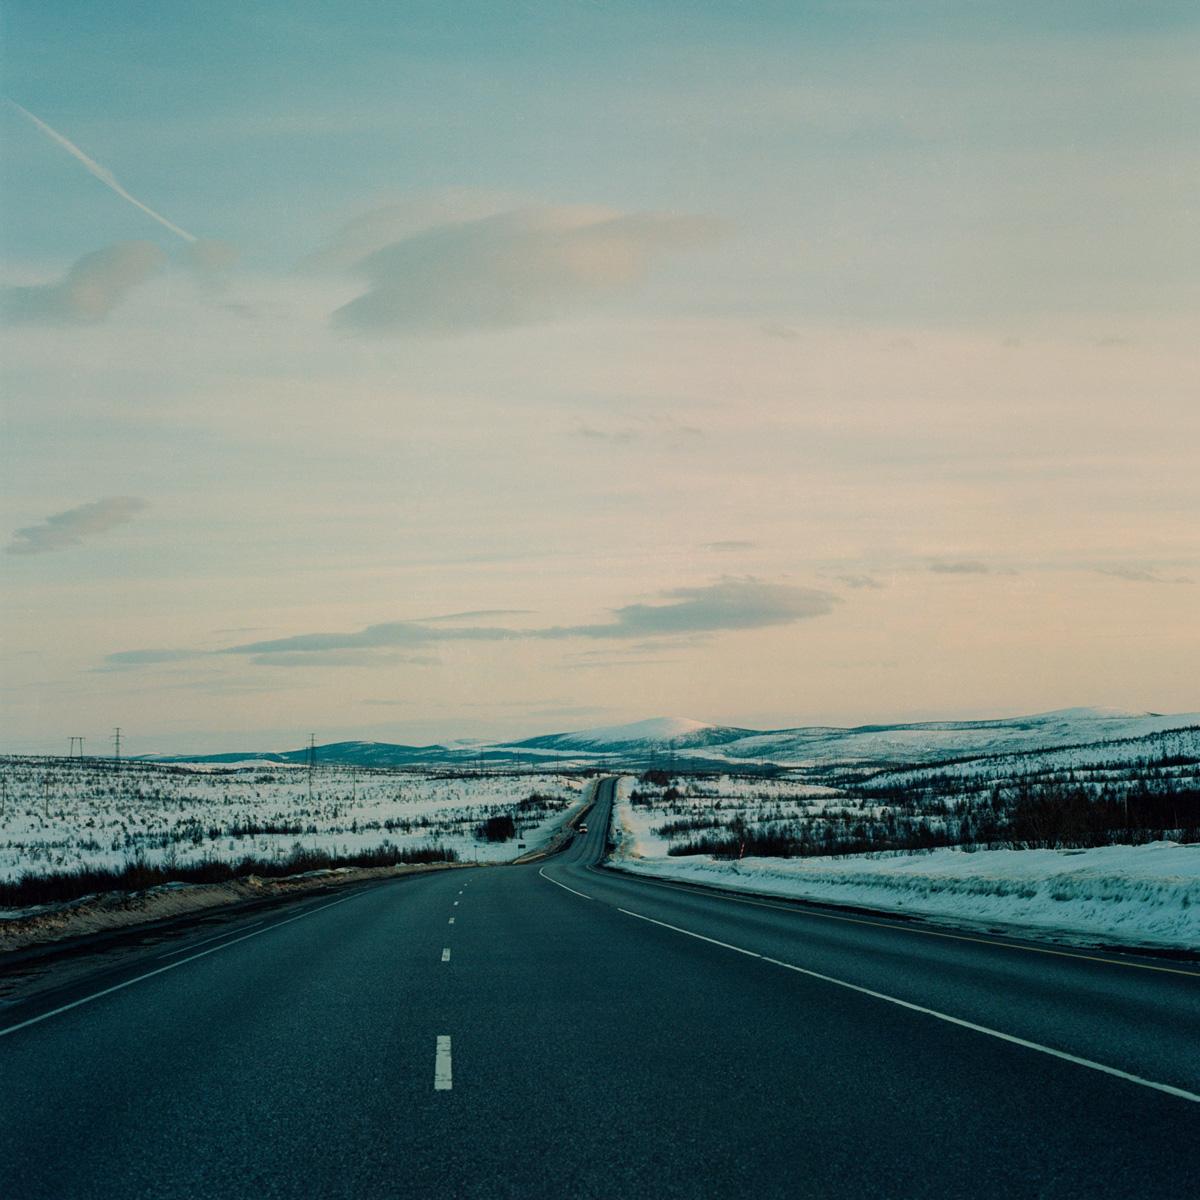 Mikhail Lebedev Snow Desert C41magazine Photography 19